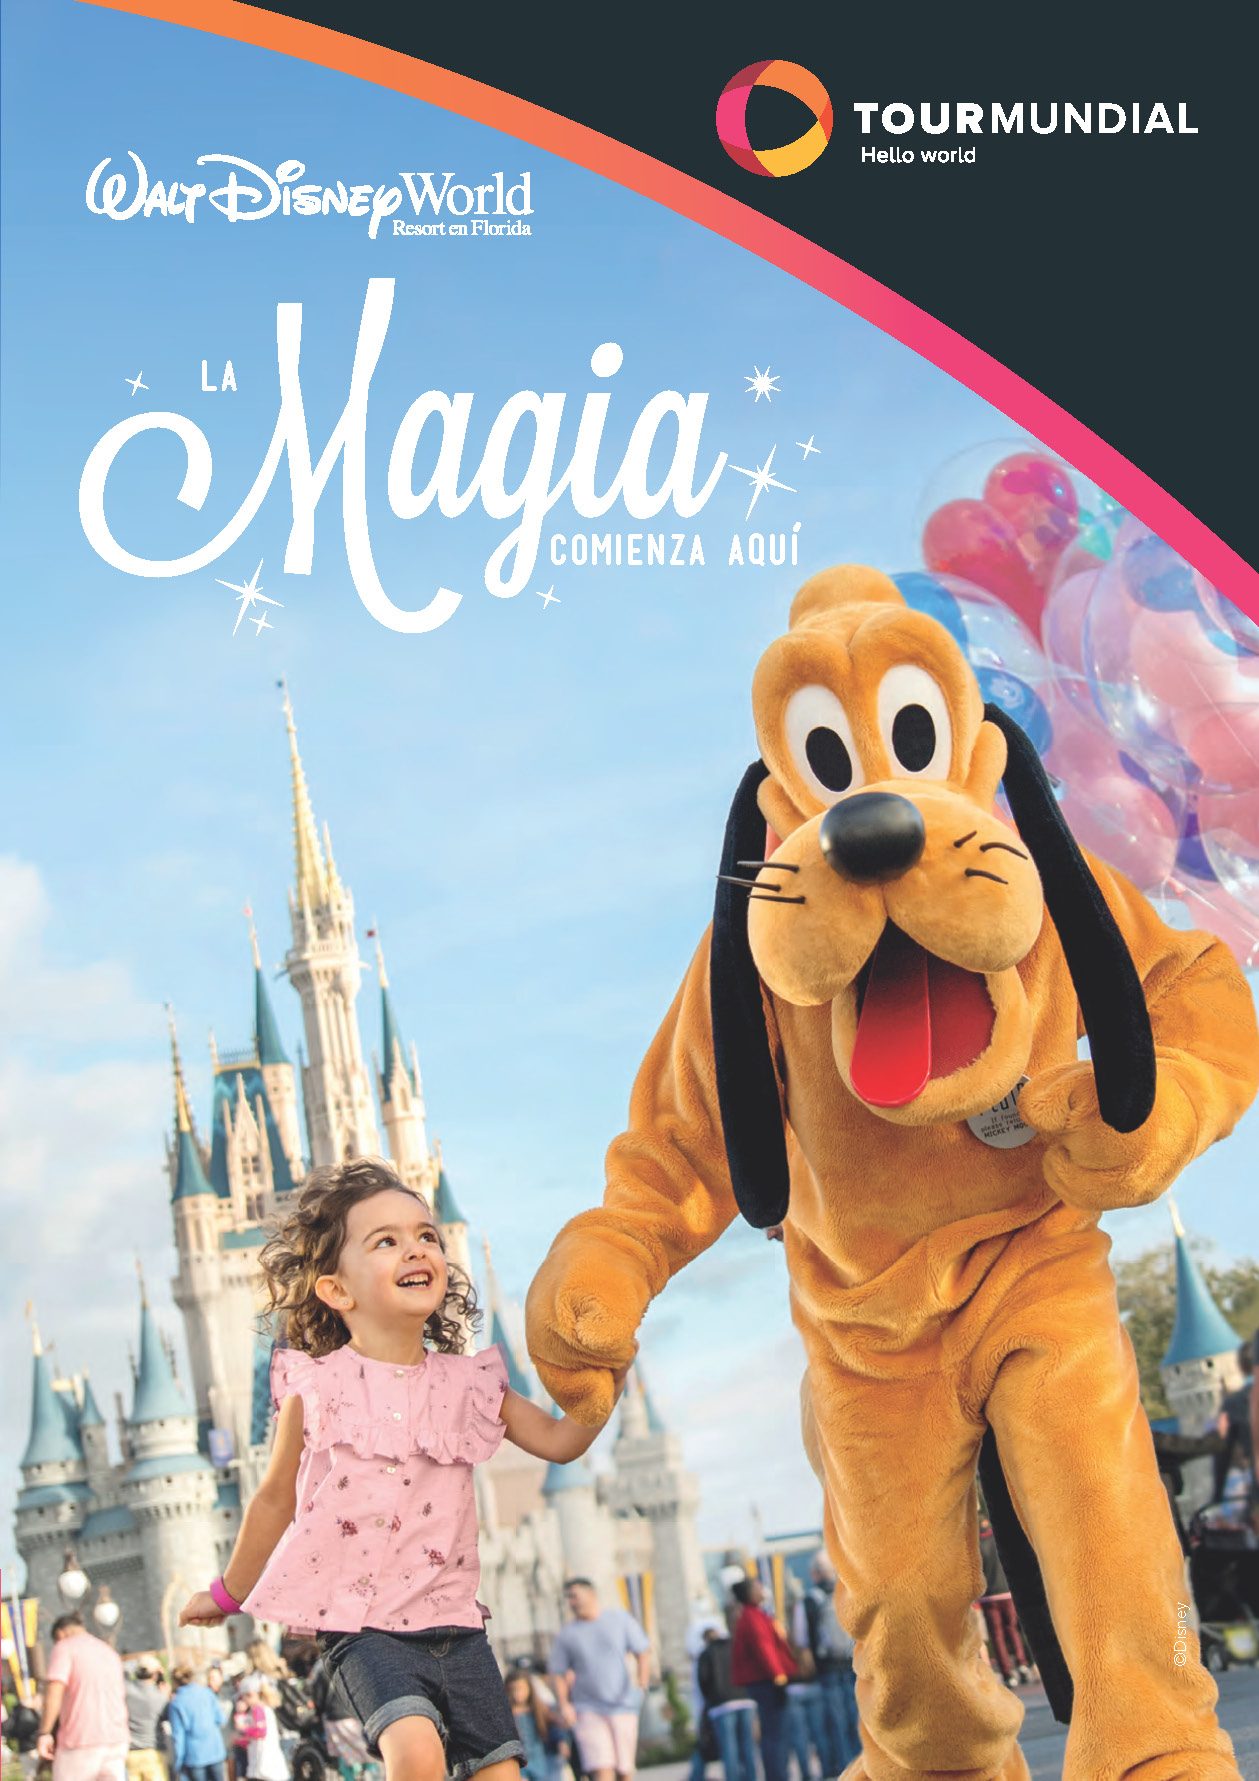 Catalogo Tourmundial Walt Disney World 2019